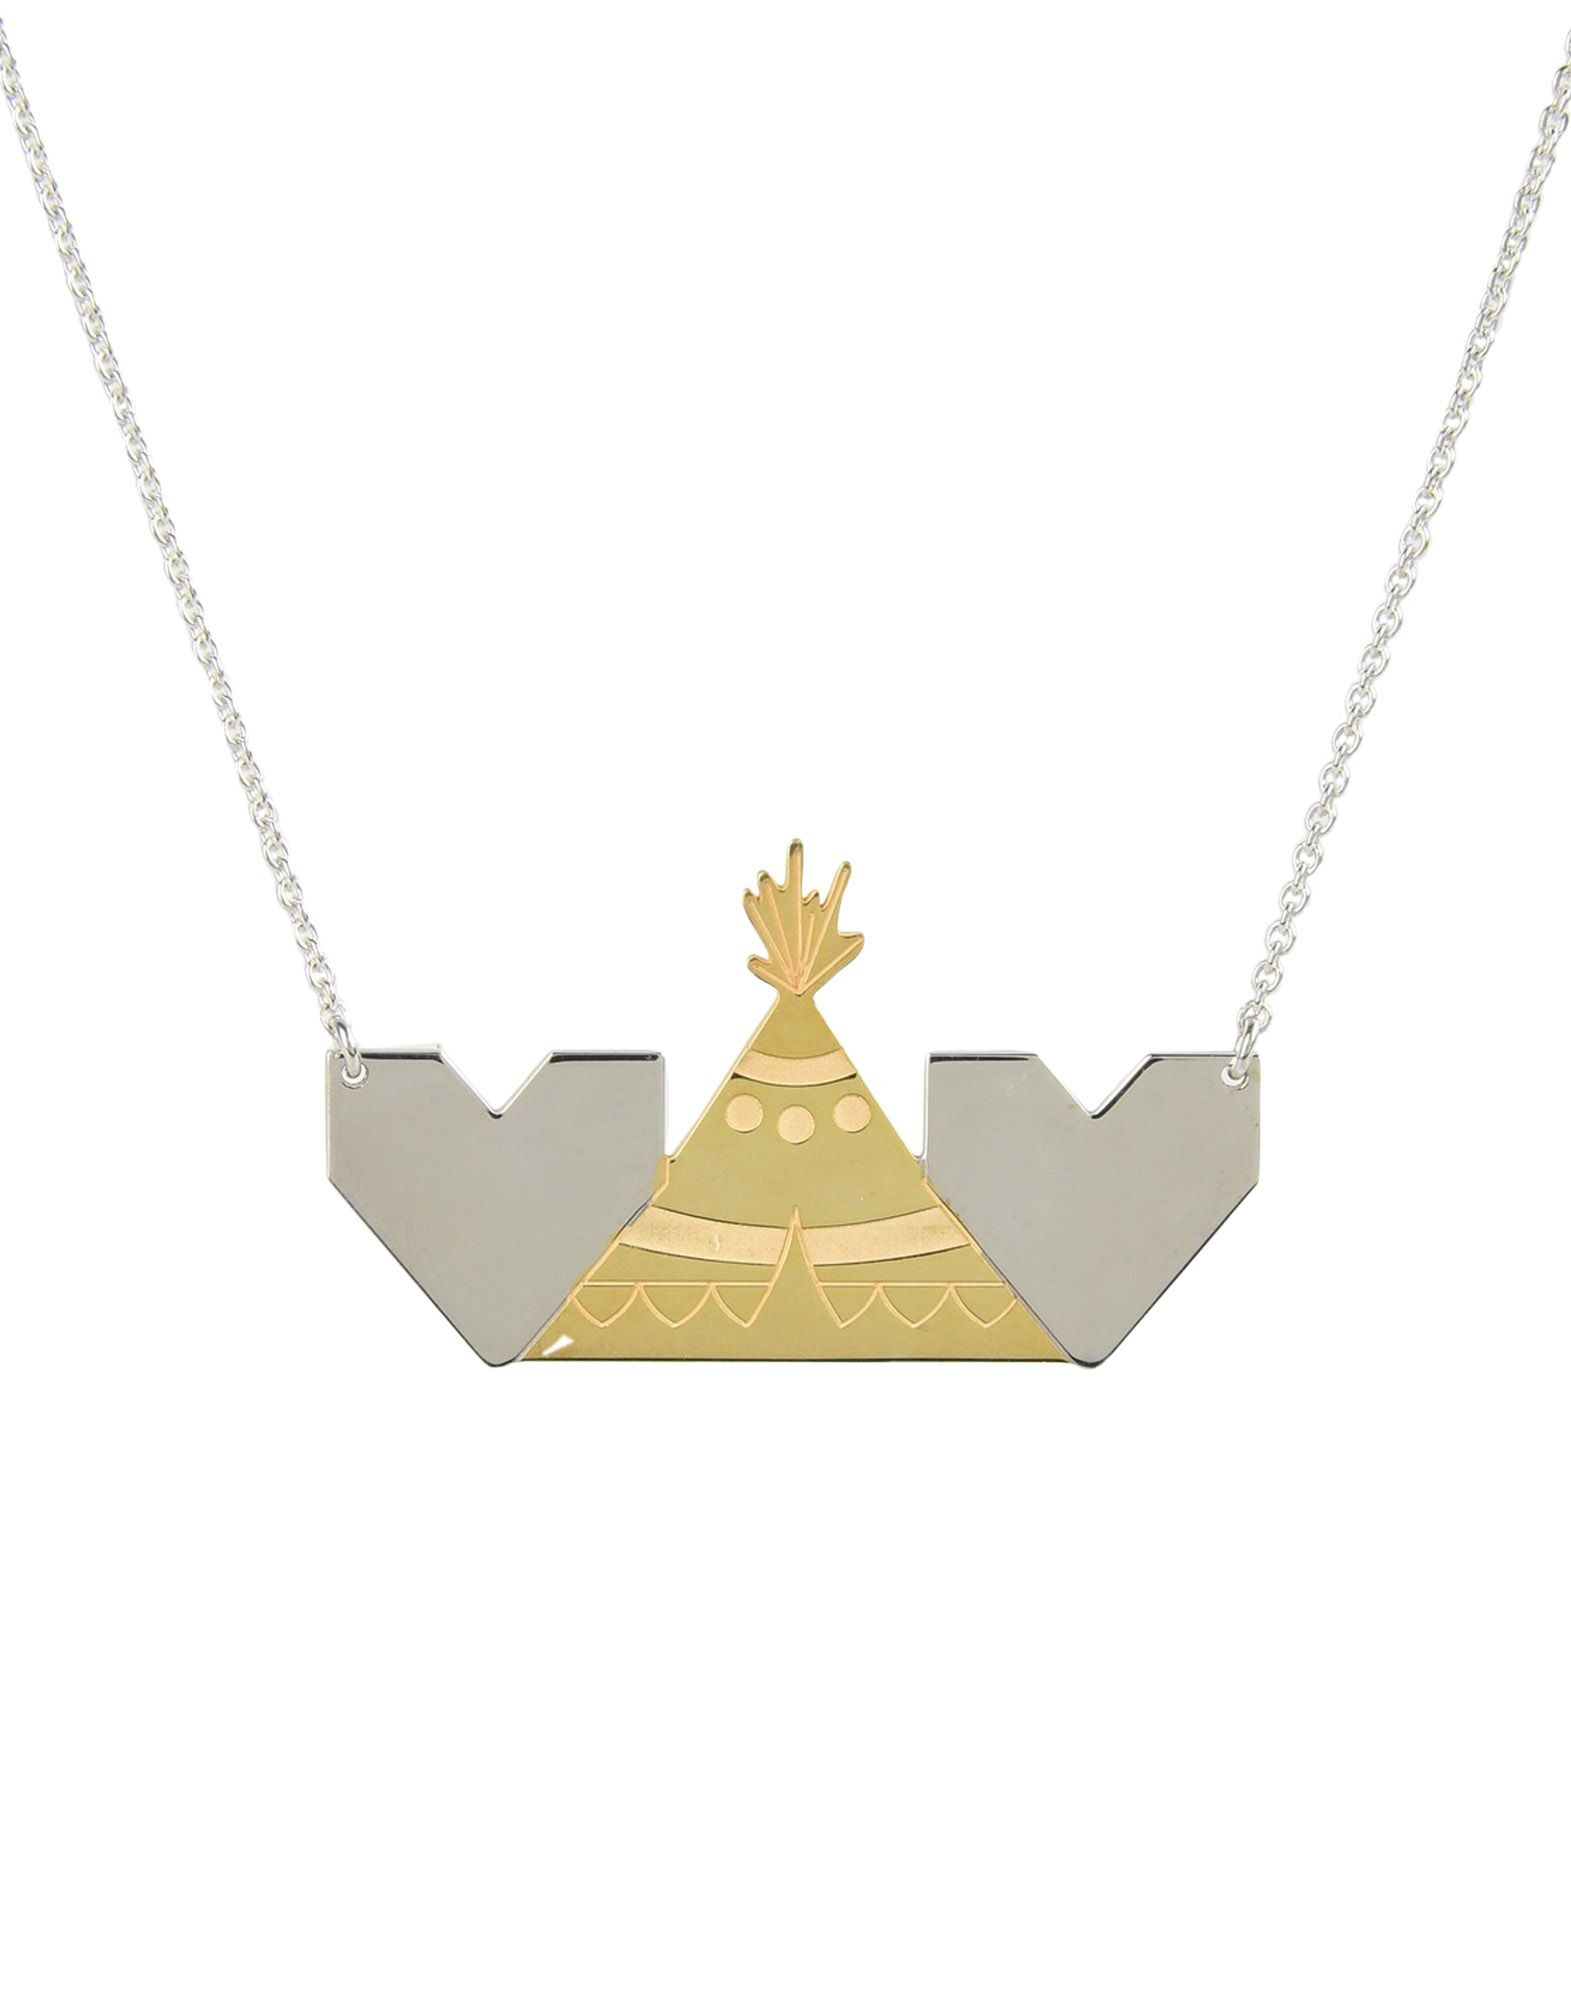 Collana First People First Necklace 2Cuori E 1 Capanna - Donna - Acquista online su